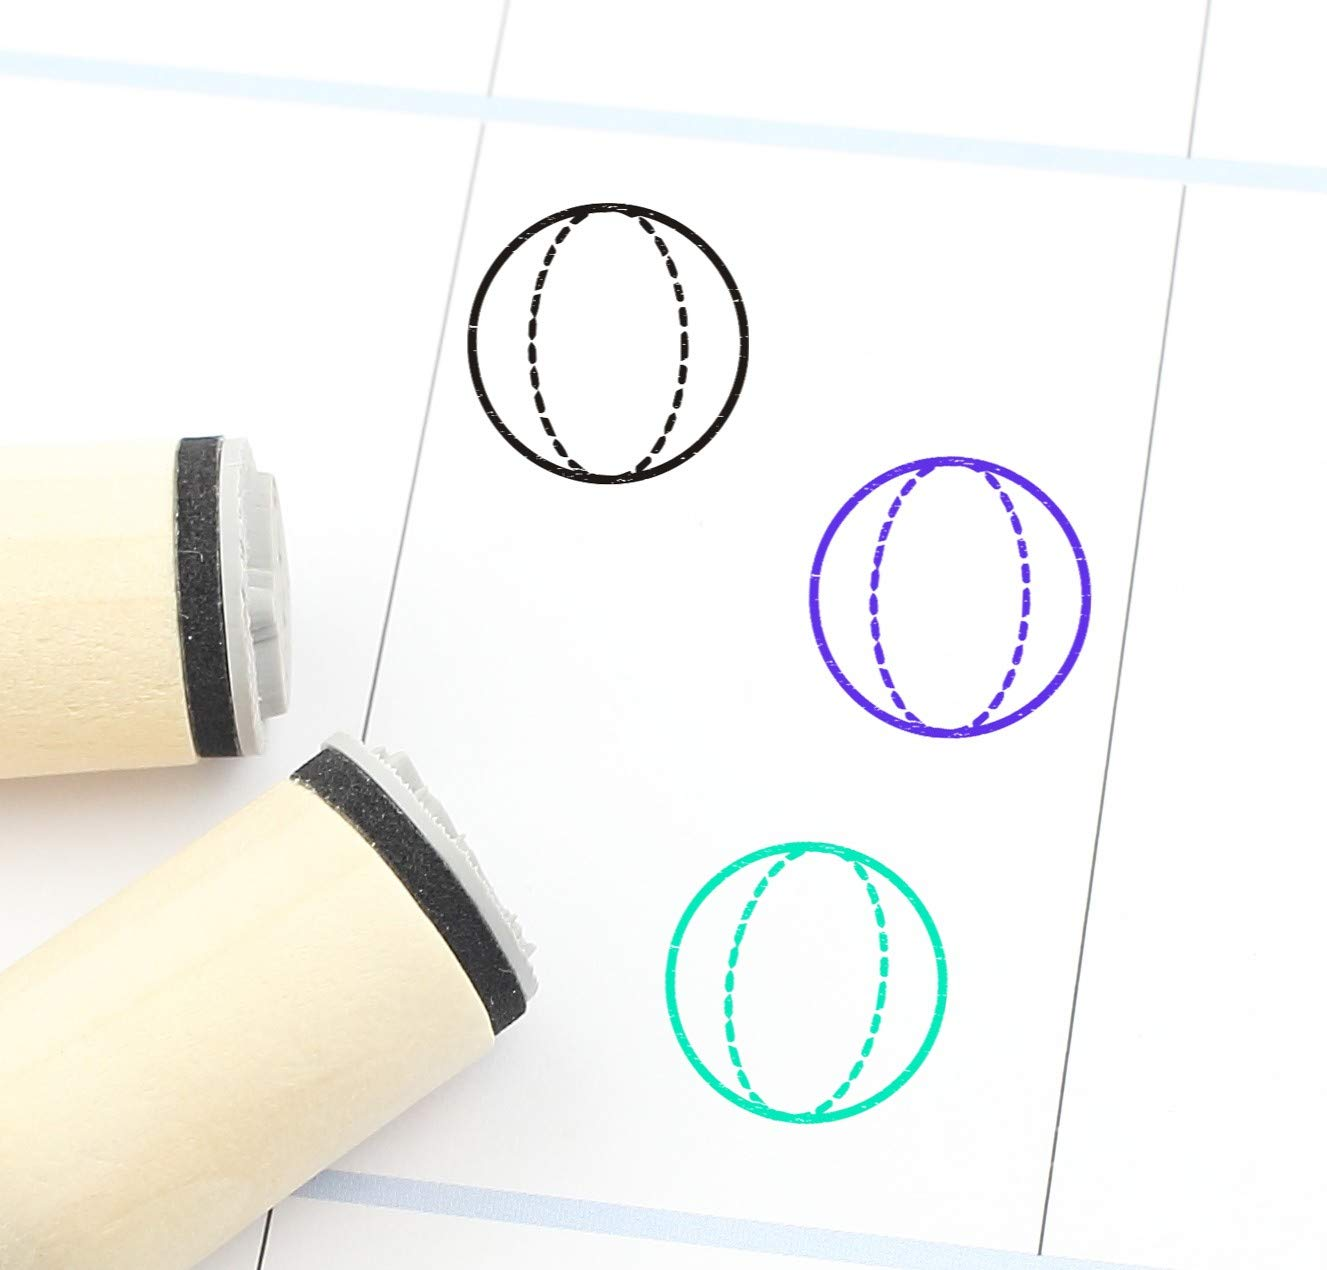 Sphere Rubber Stamp 3D Popular Plann Cute Geometry New item